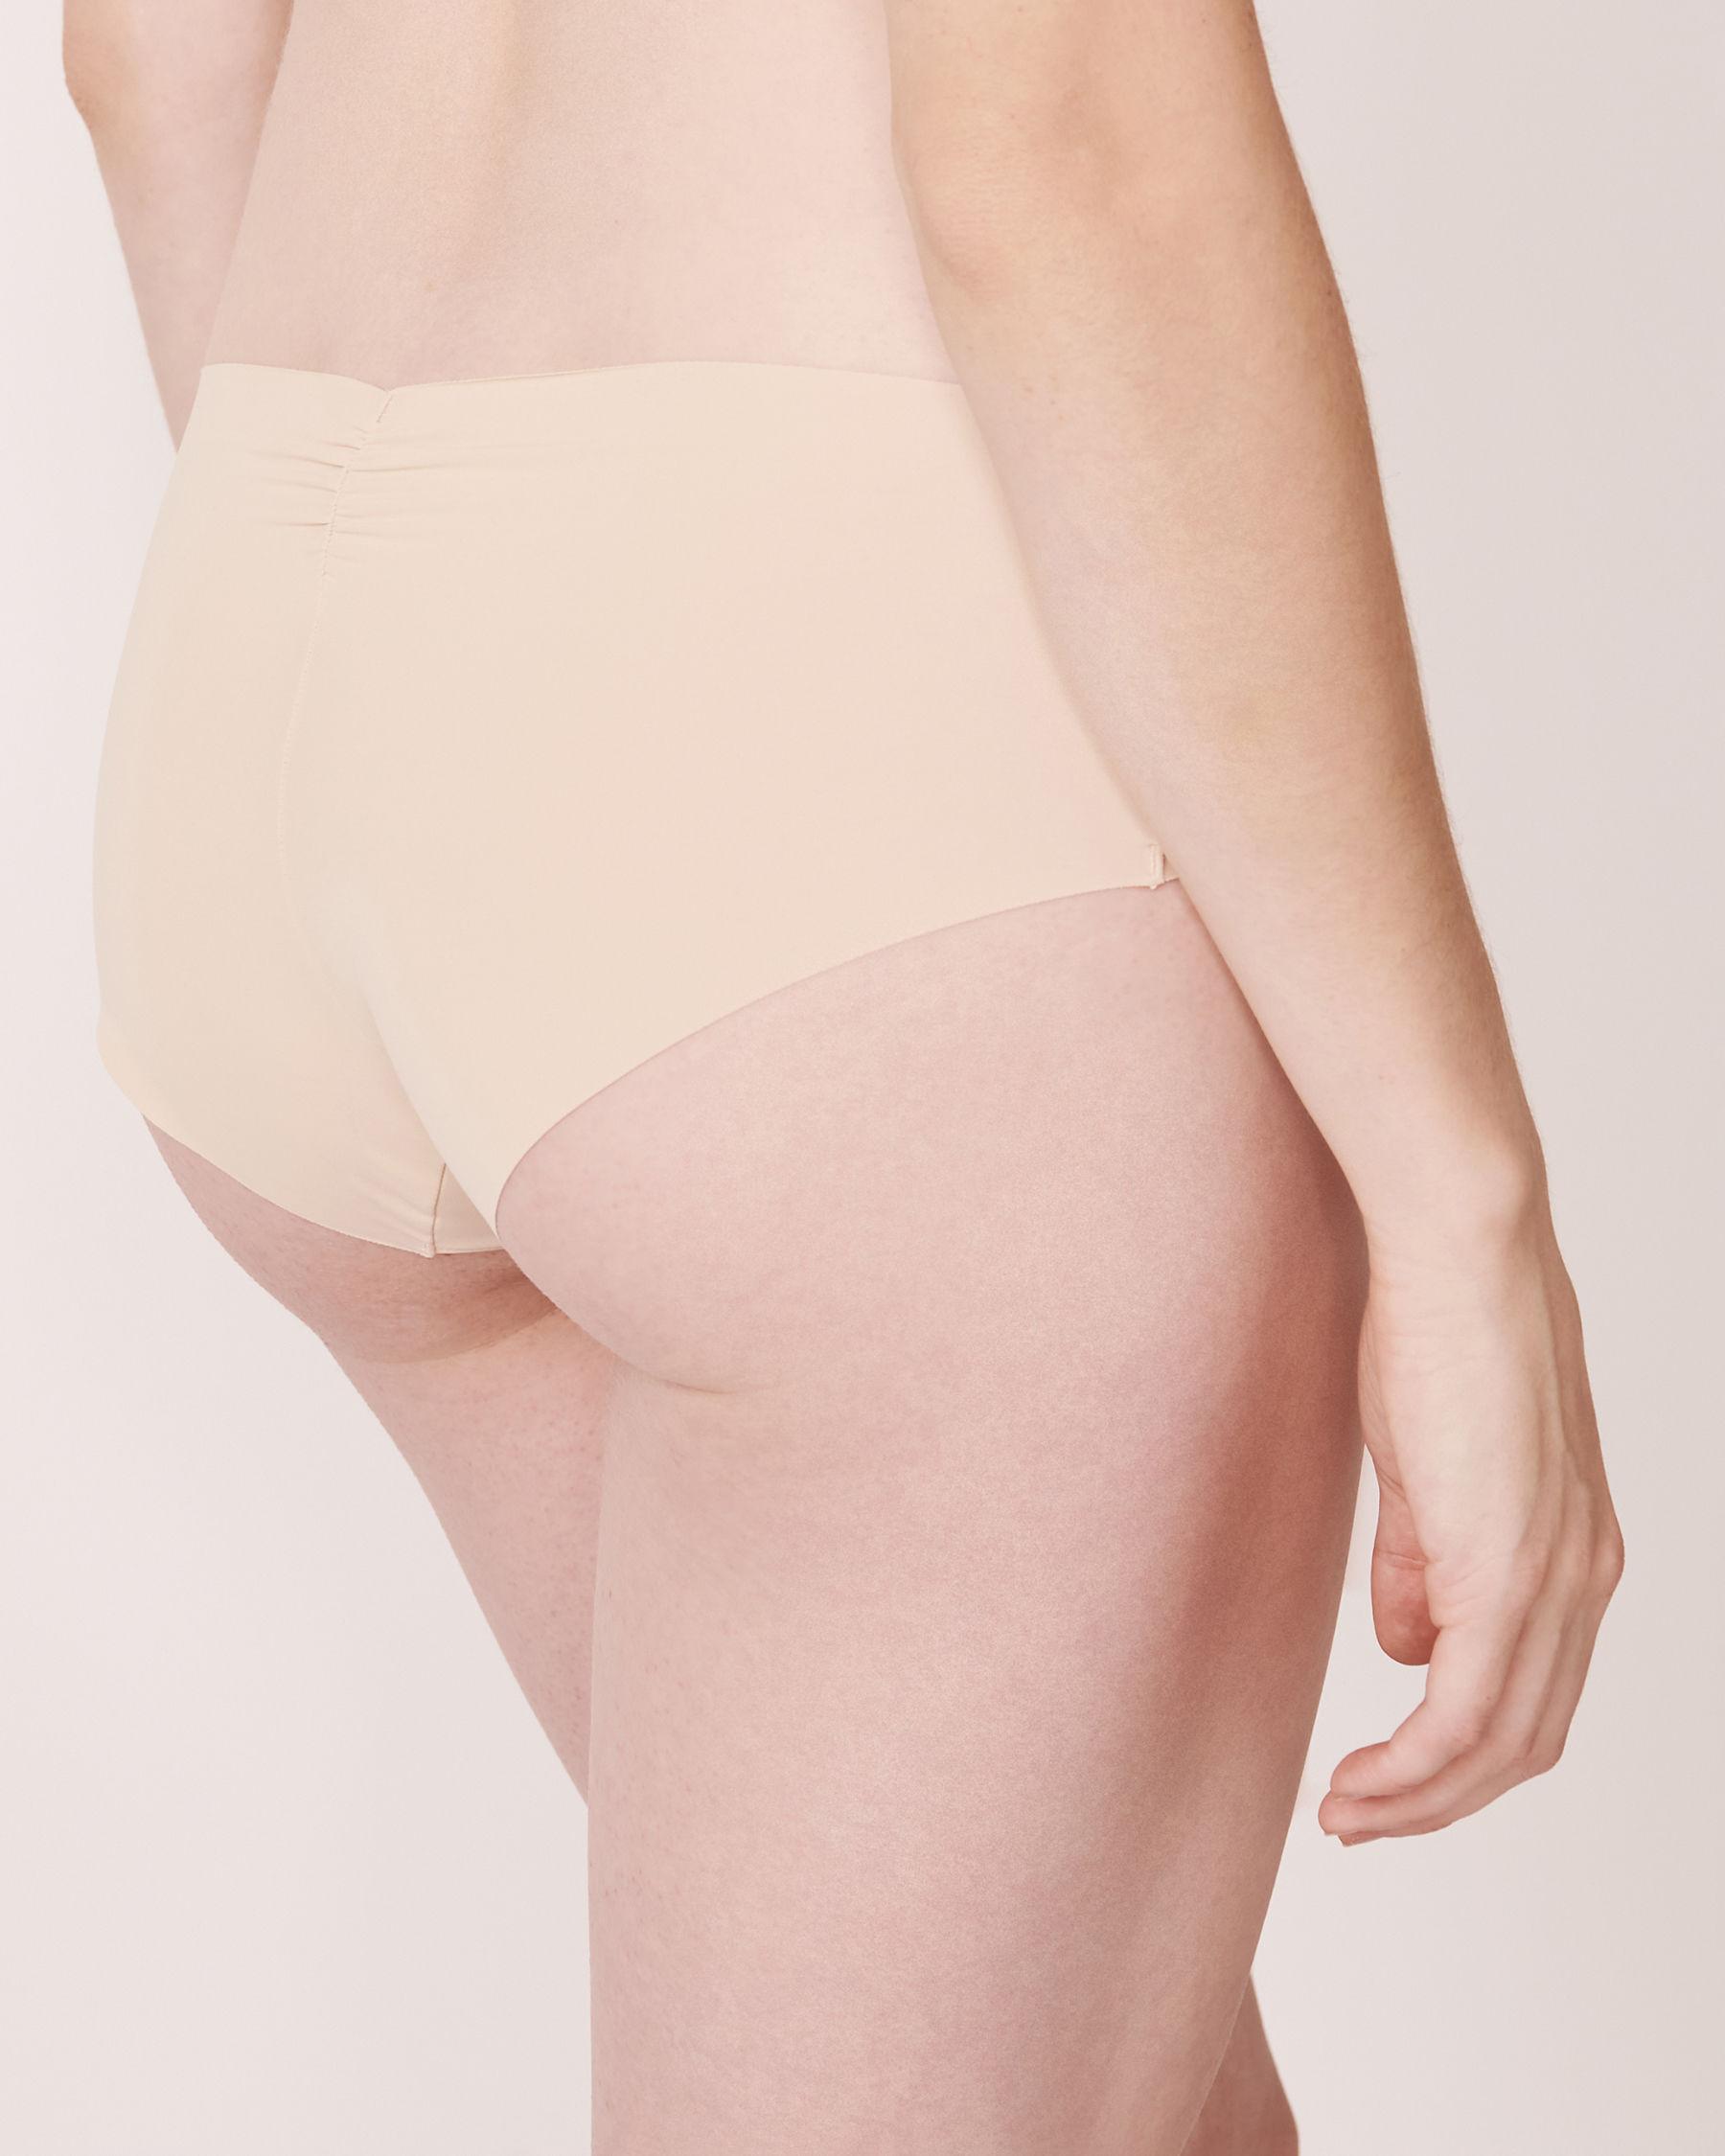 LA VIE EN ROSE Hiphugger Panty Neutral 619-223-1-00 - View2